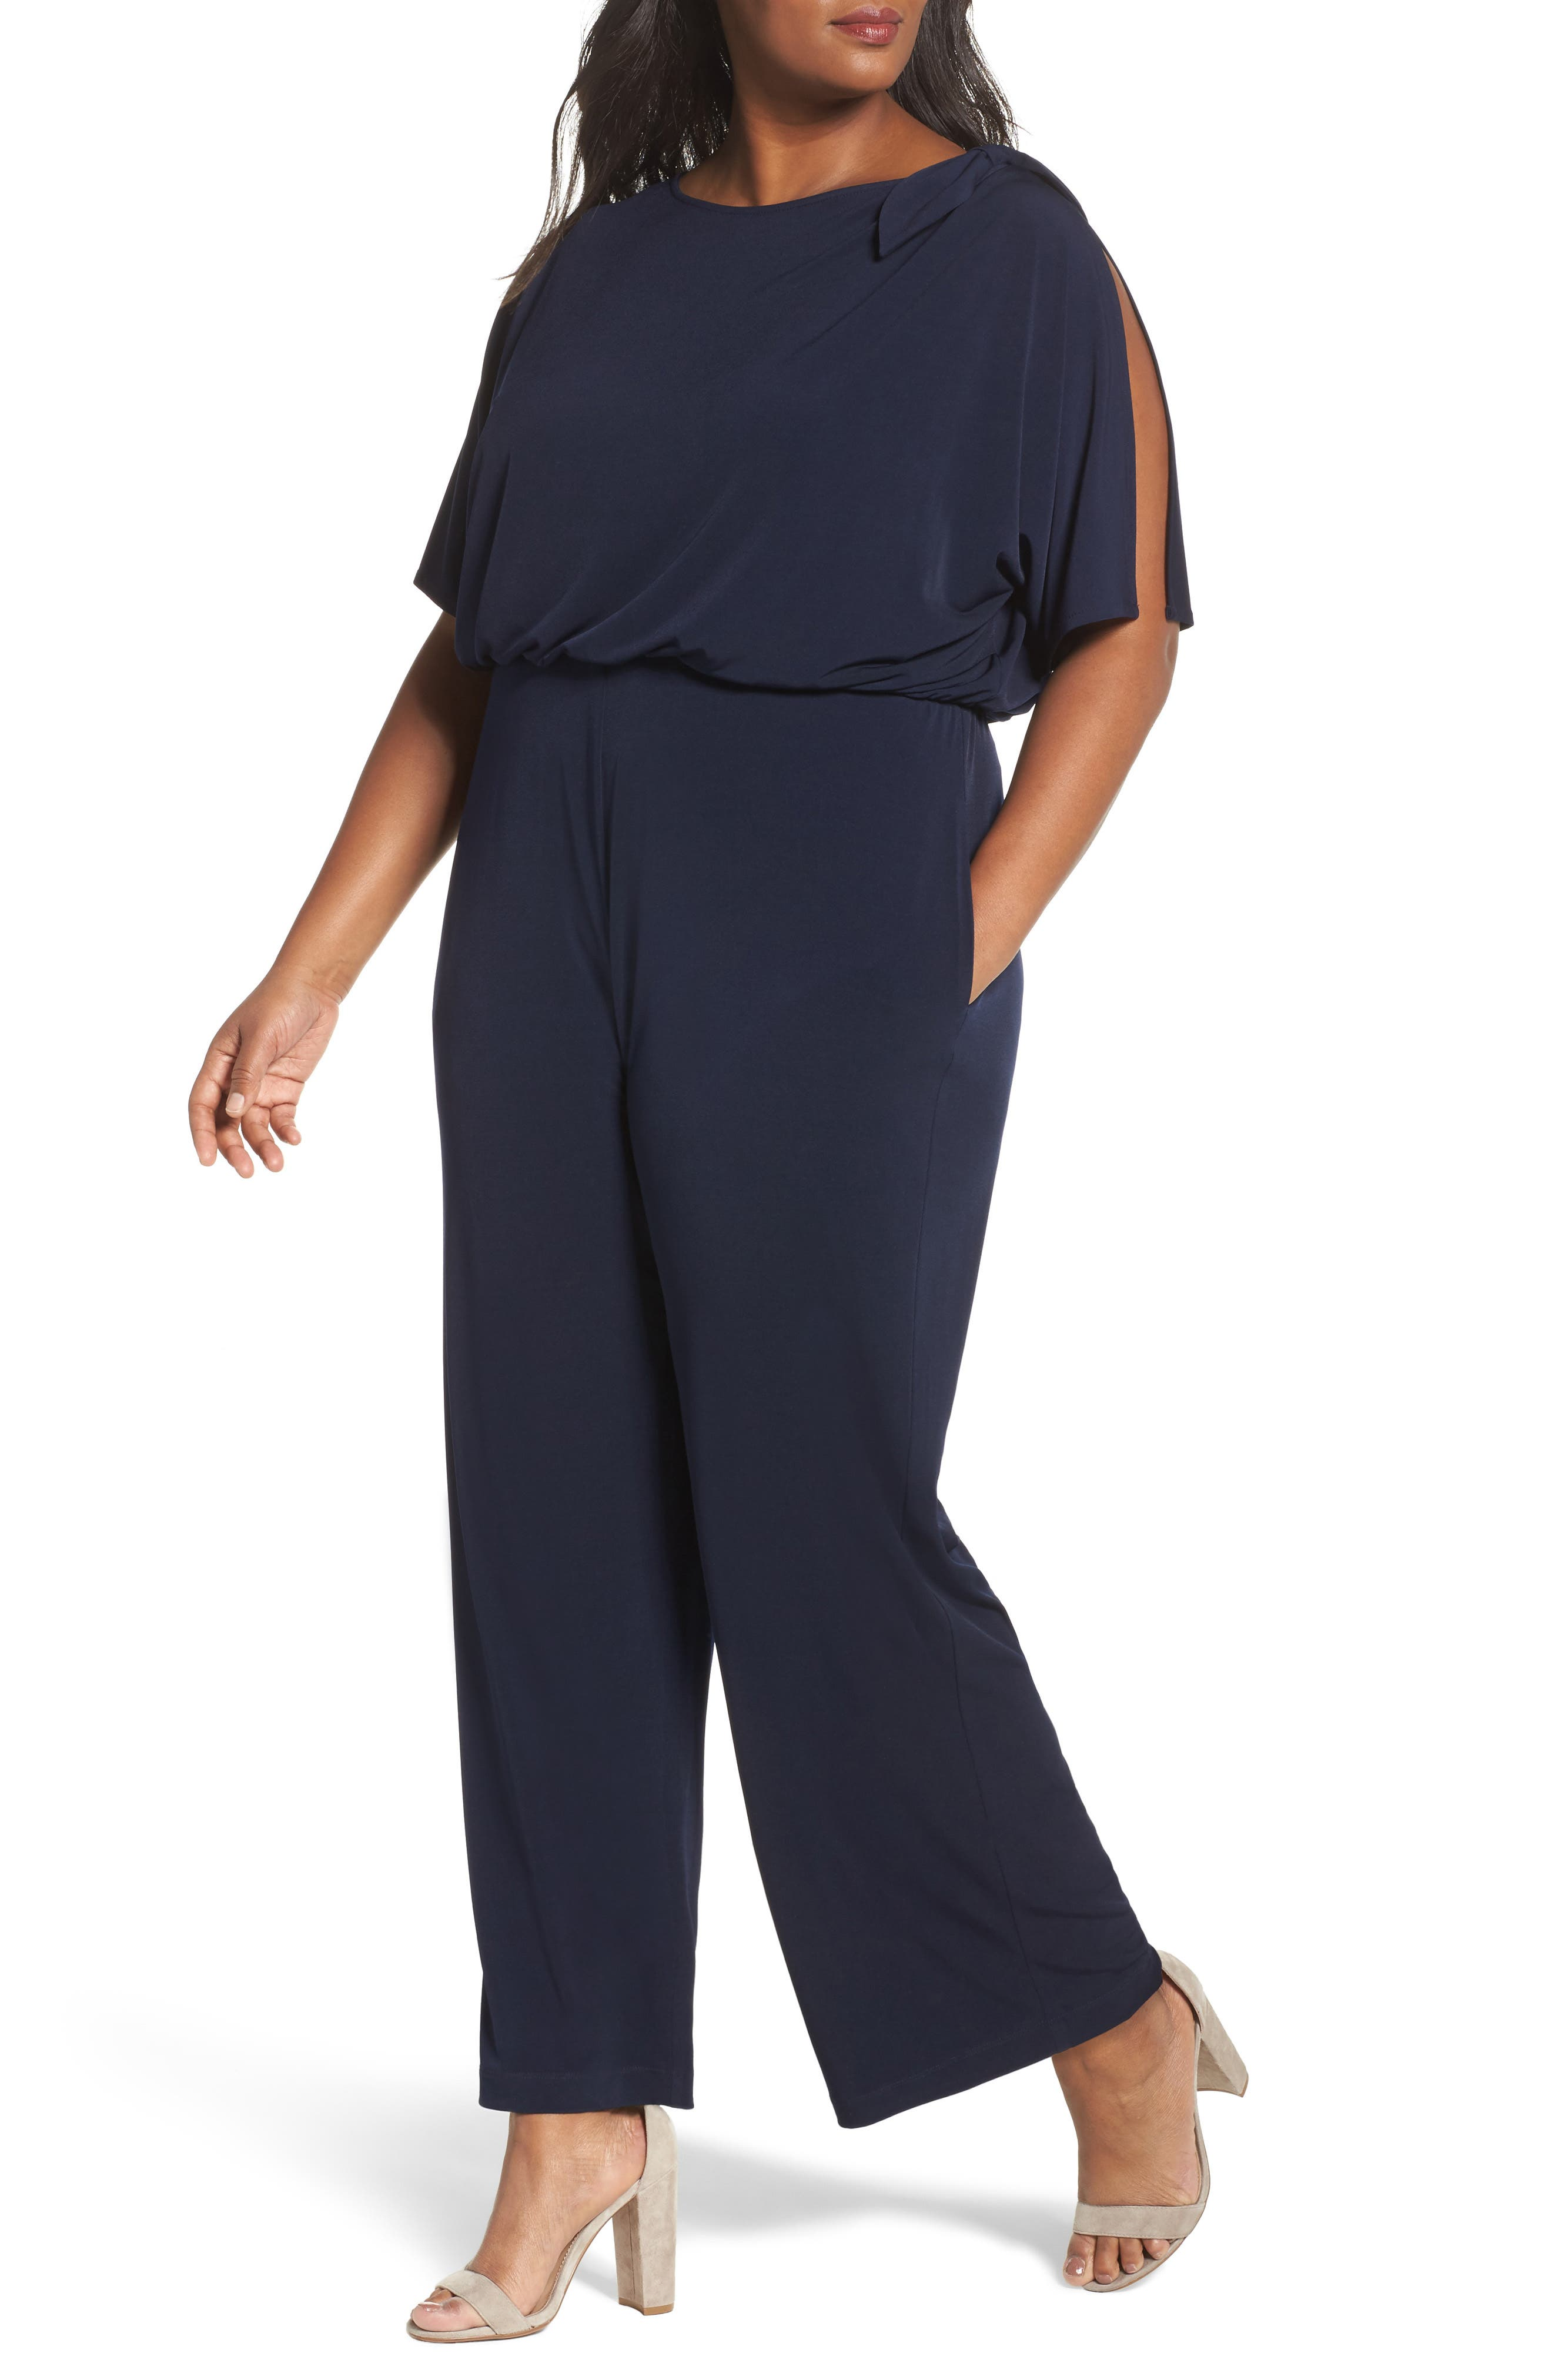 Alternate Image 1 Selected - Vince Camuto Crepe Split Sleeve Jumpsuit (Plus Size)